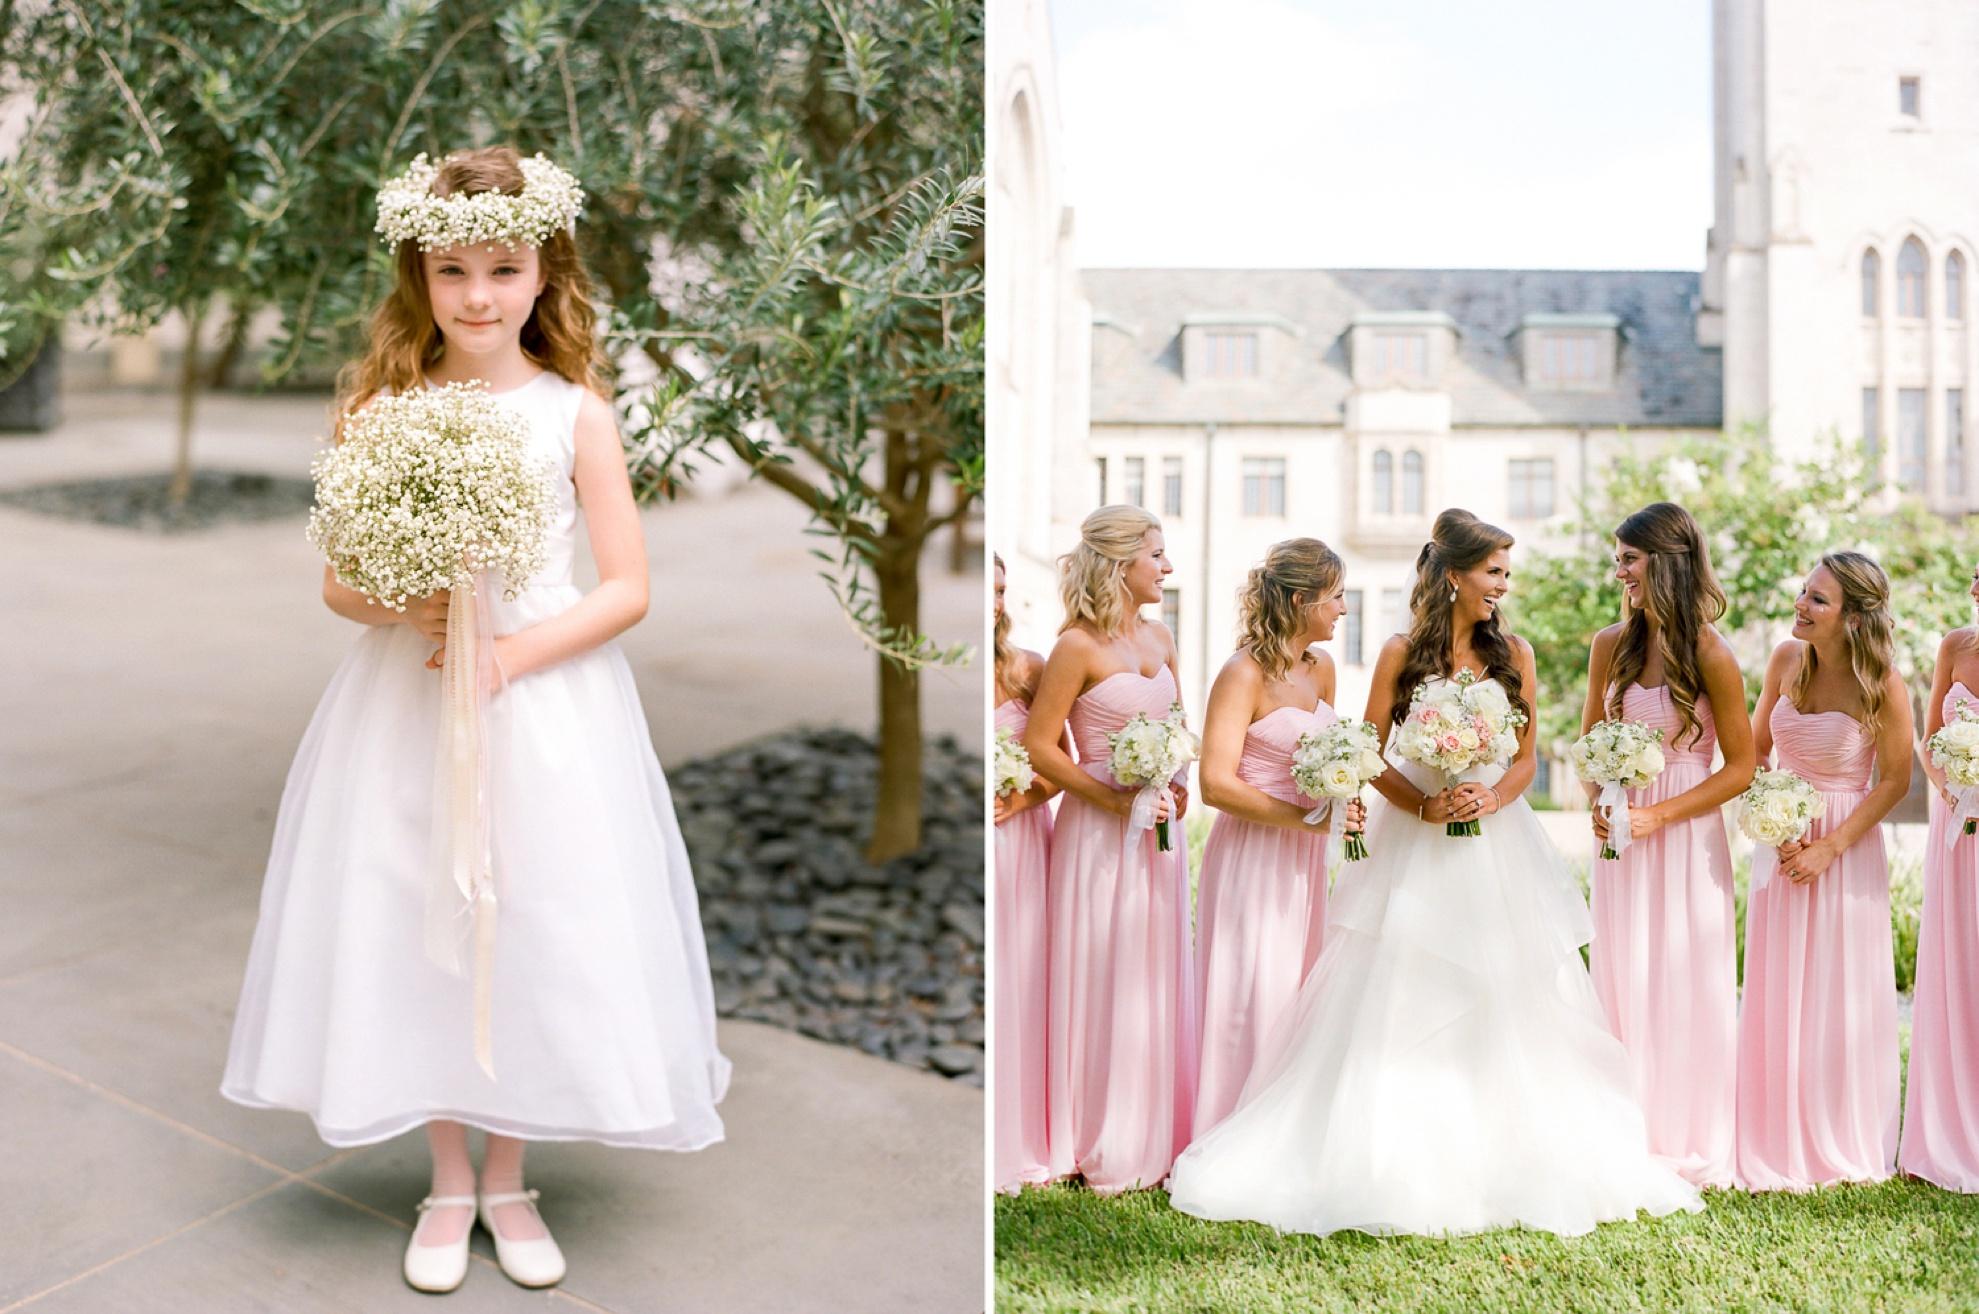 St-Paul's-United Methodist-Wedding-Houston-Photographer-Dana-Fernandez-Weddings-In-Houston-Magazine-Feature.jpg